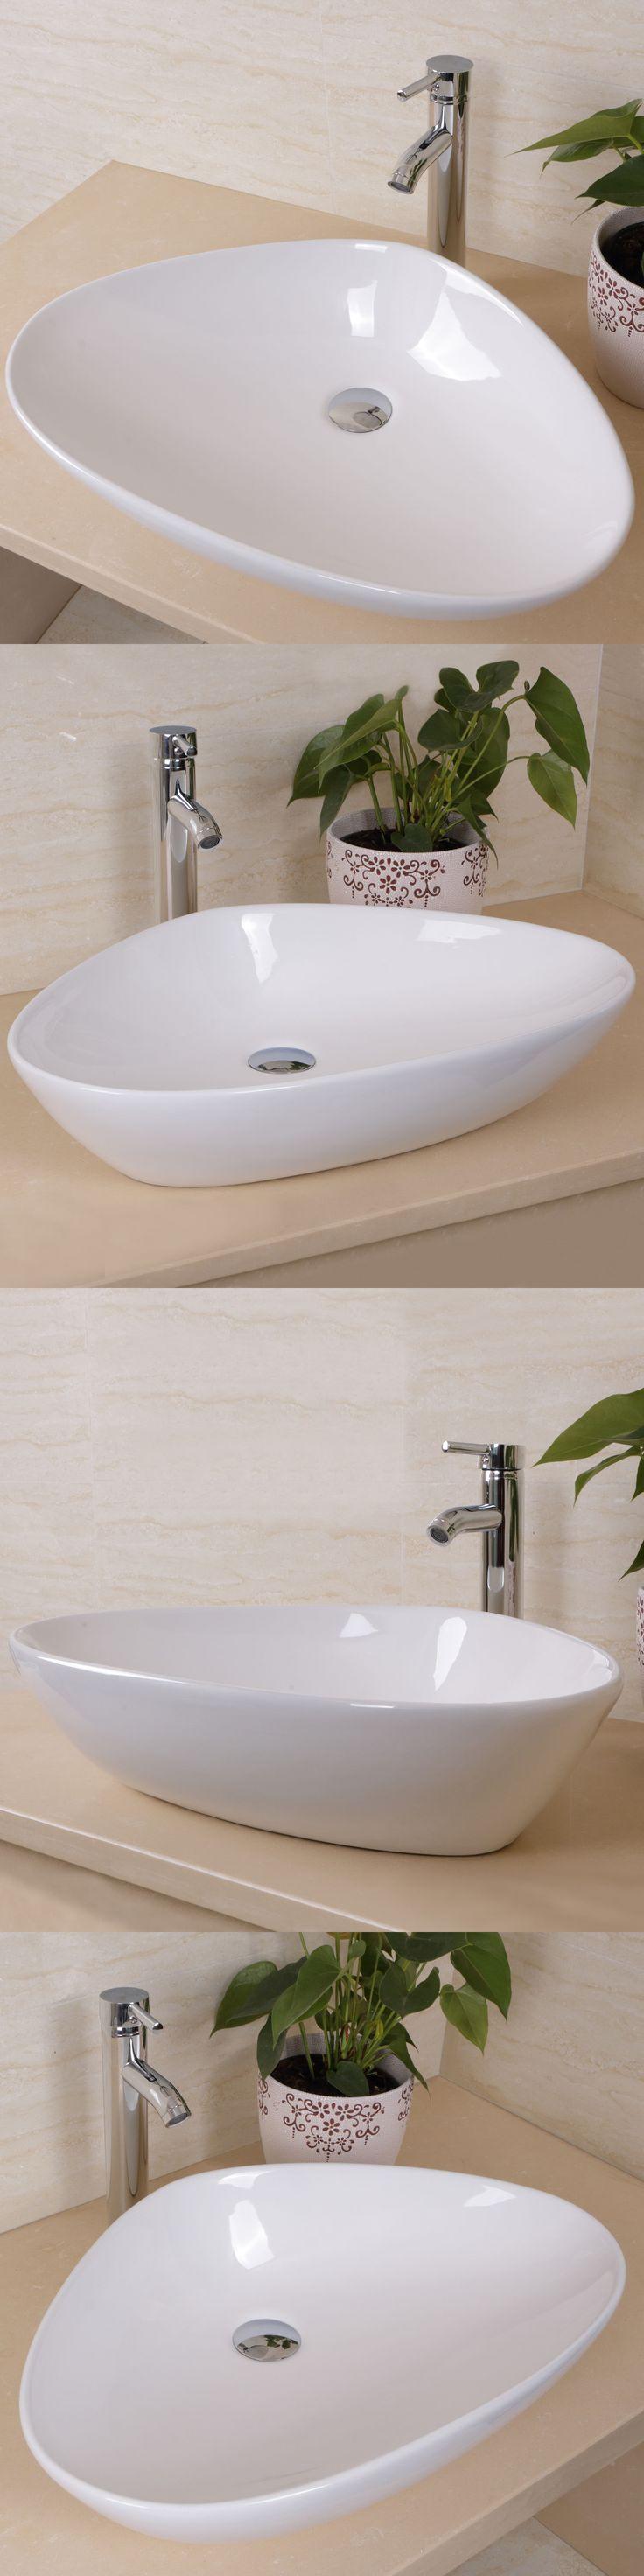 Pinterest'teki 25'den Fazla En Iyi Bathroom Sink Bowls Fikri Brilliant Sink Bowl Bathroom Design Inspiration